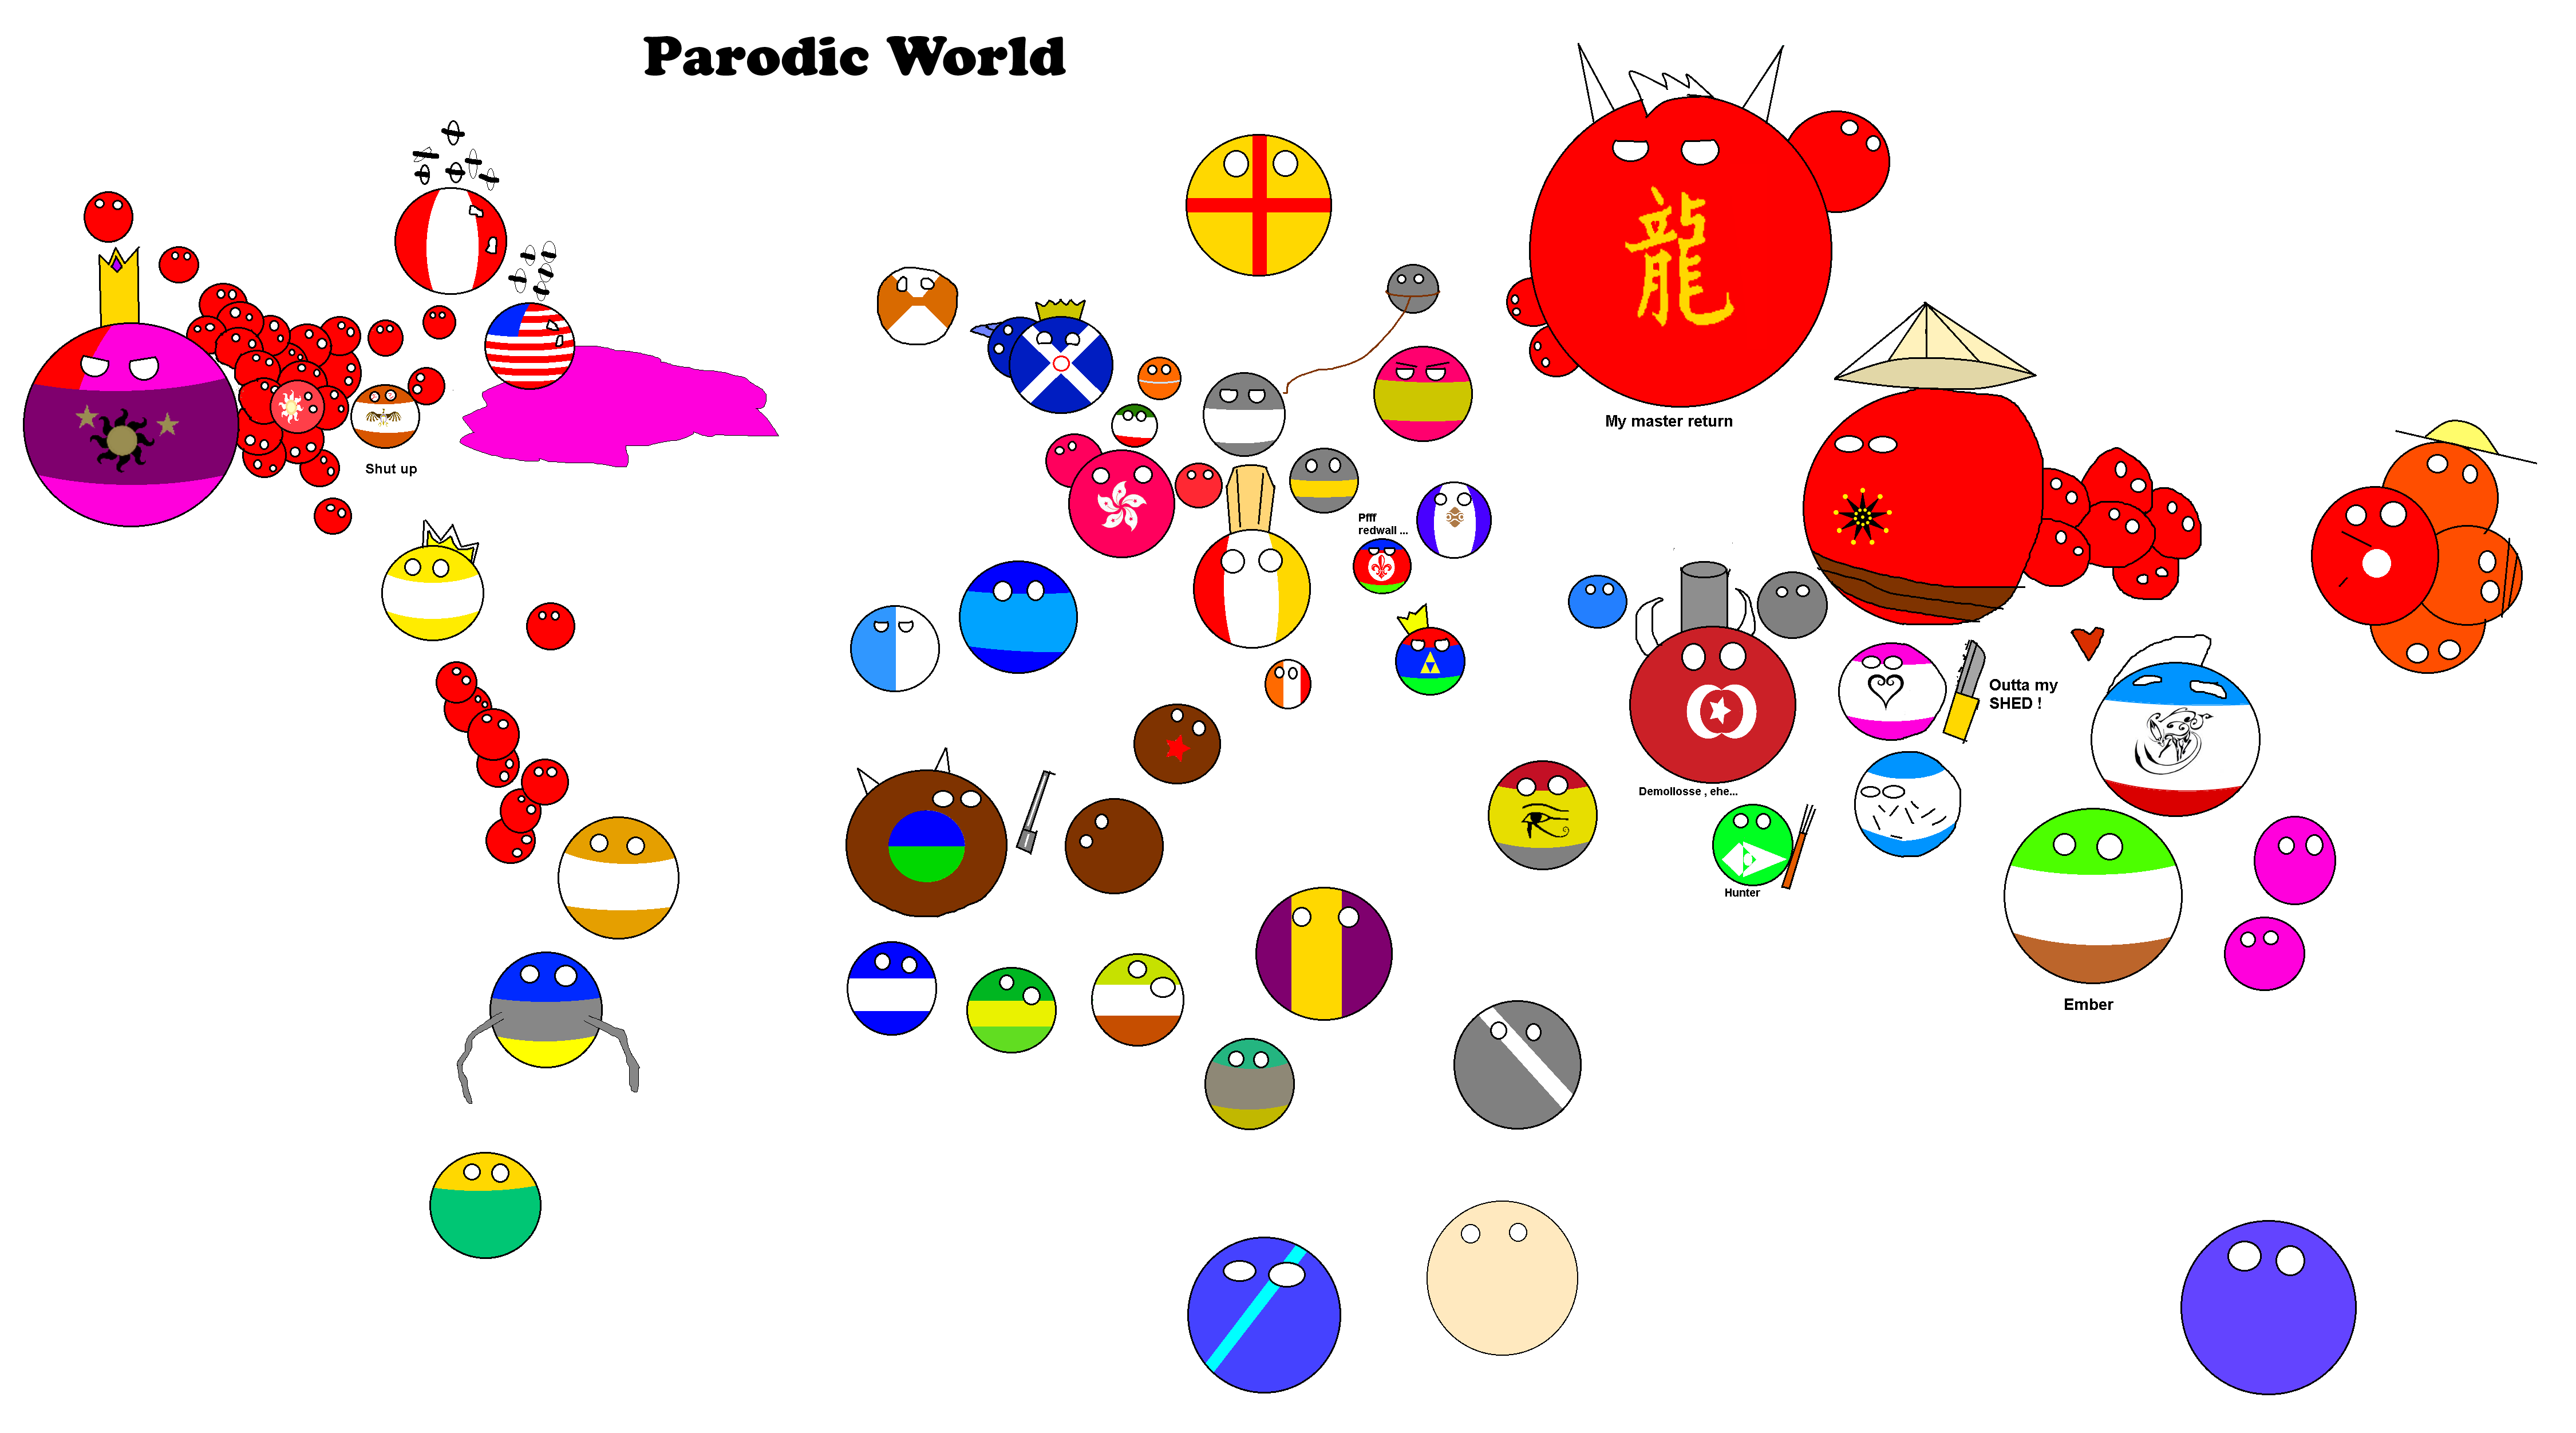 Polandball Map Of The World 2017.Map2015 Polandball World Related Keywords Suggestions Map2015